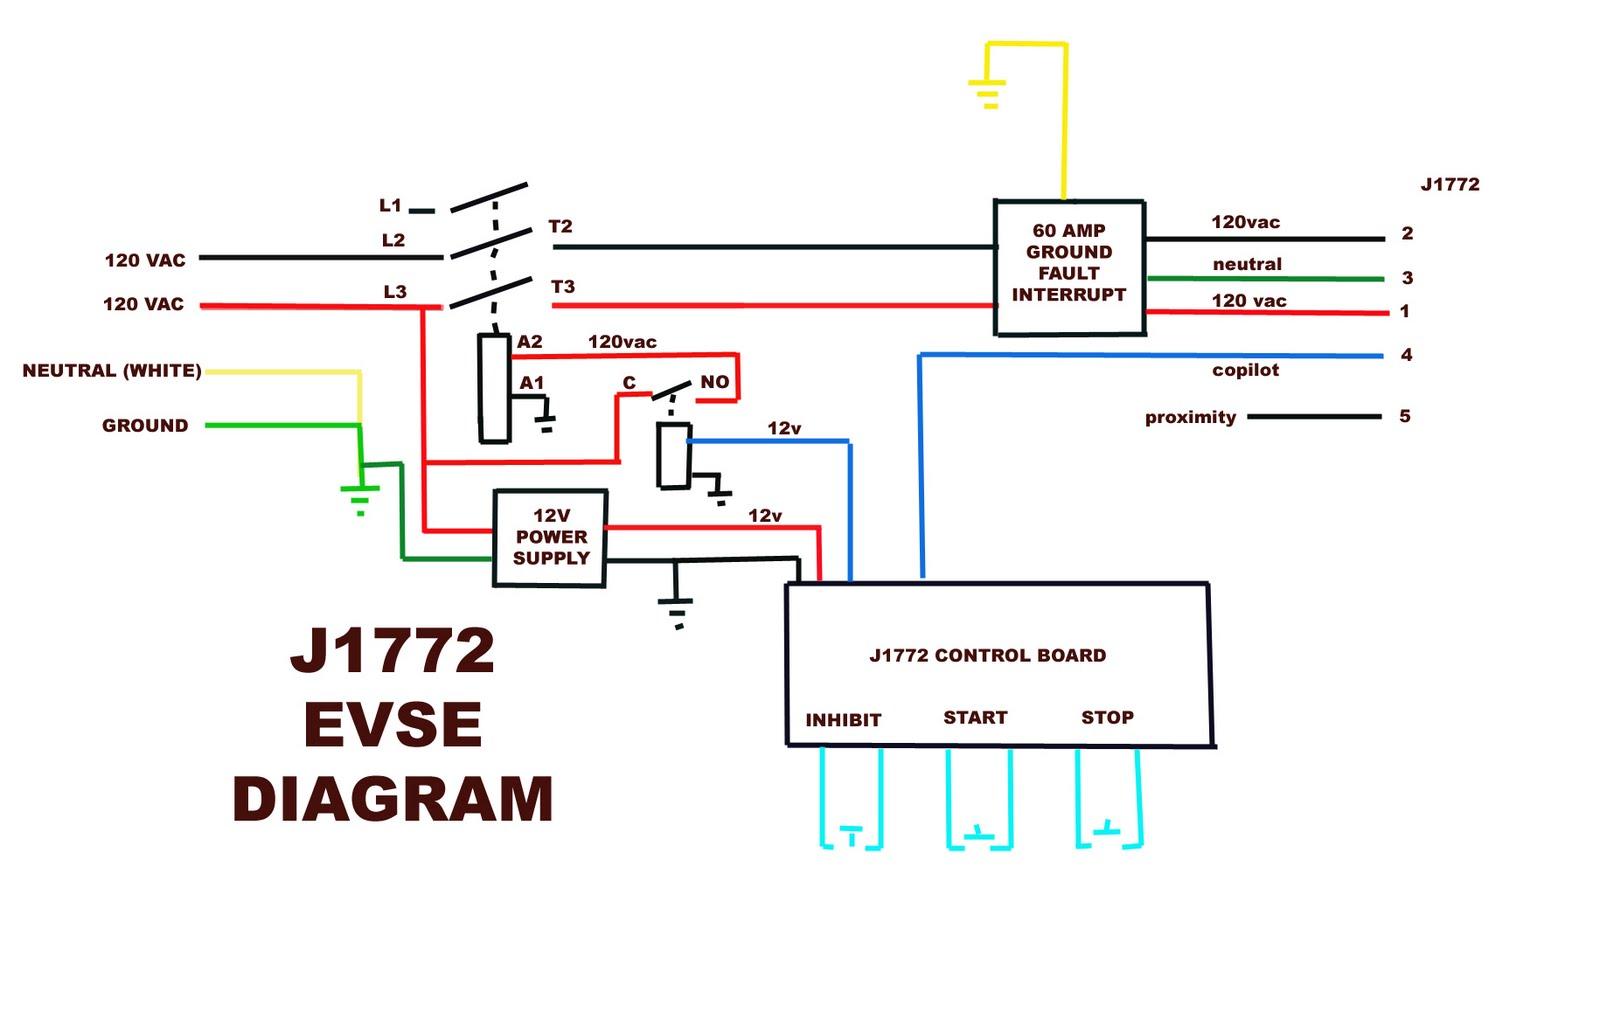 Schneider Reversing Contactor Wiring Diagram Bathroom Sink Faucet Parts Motor Starter | Get Free Image About